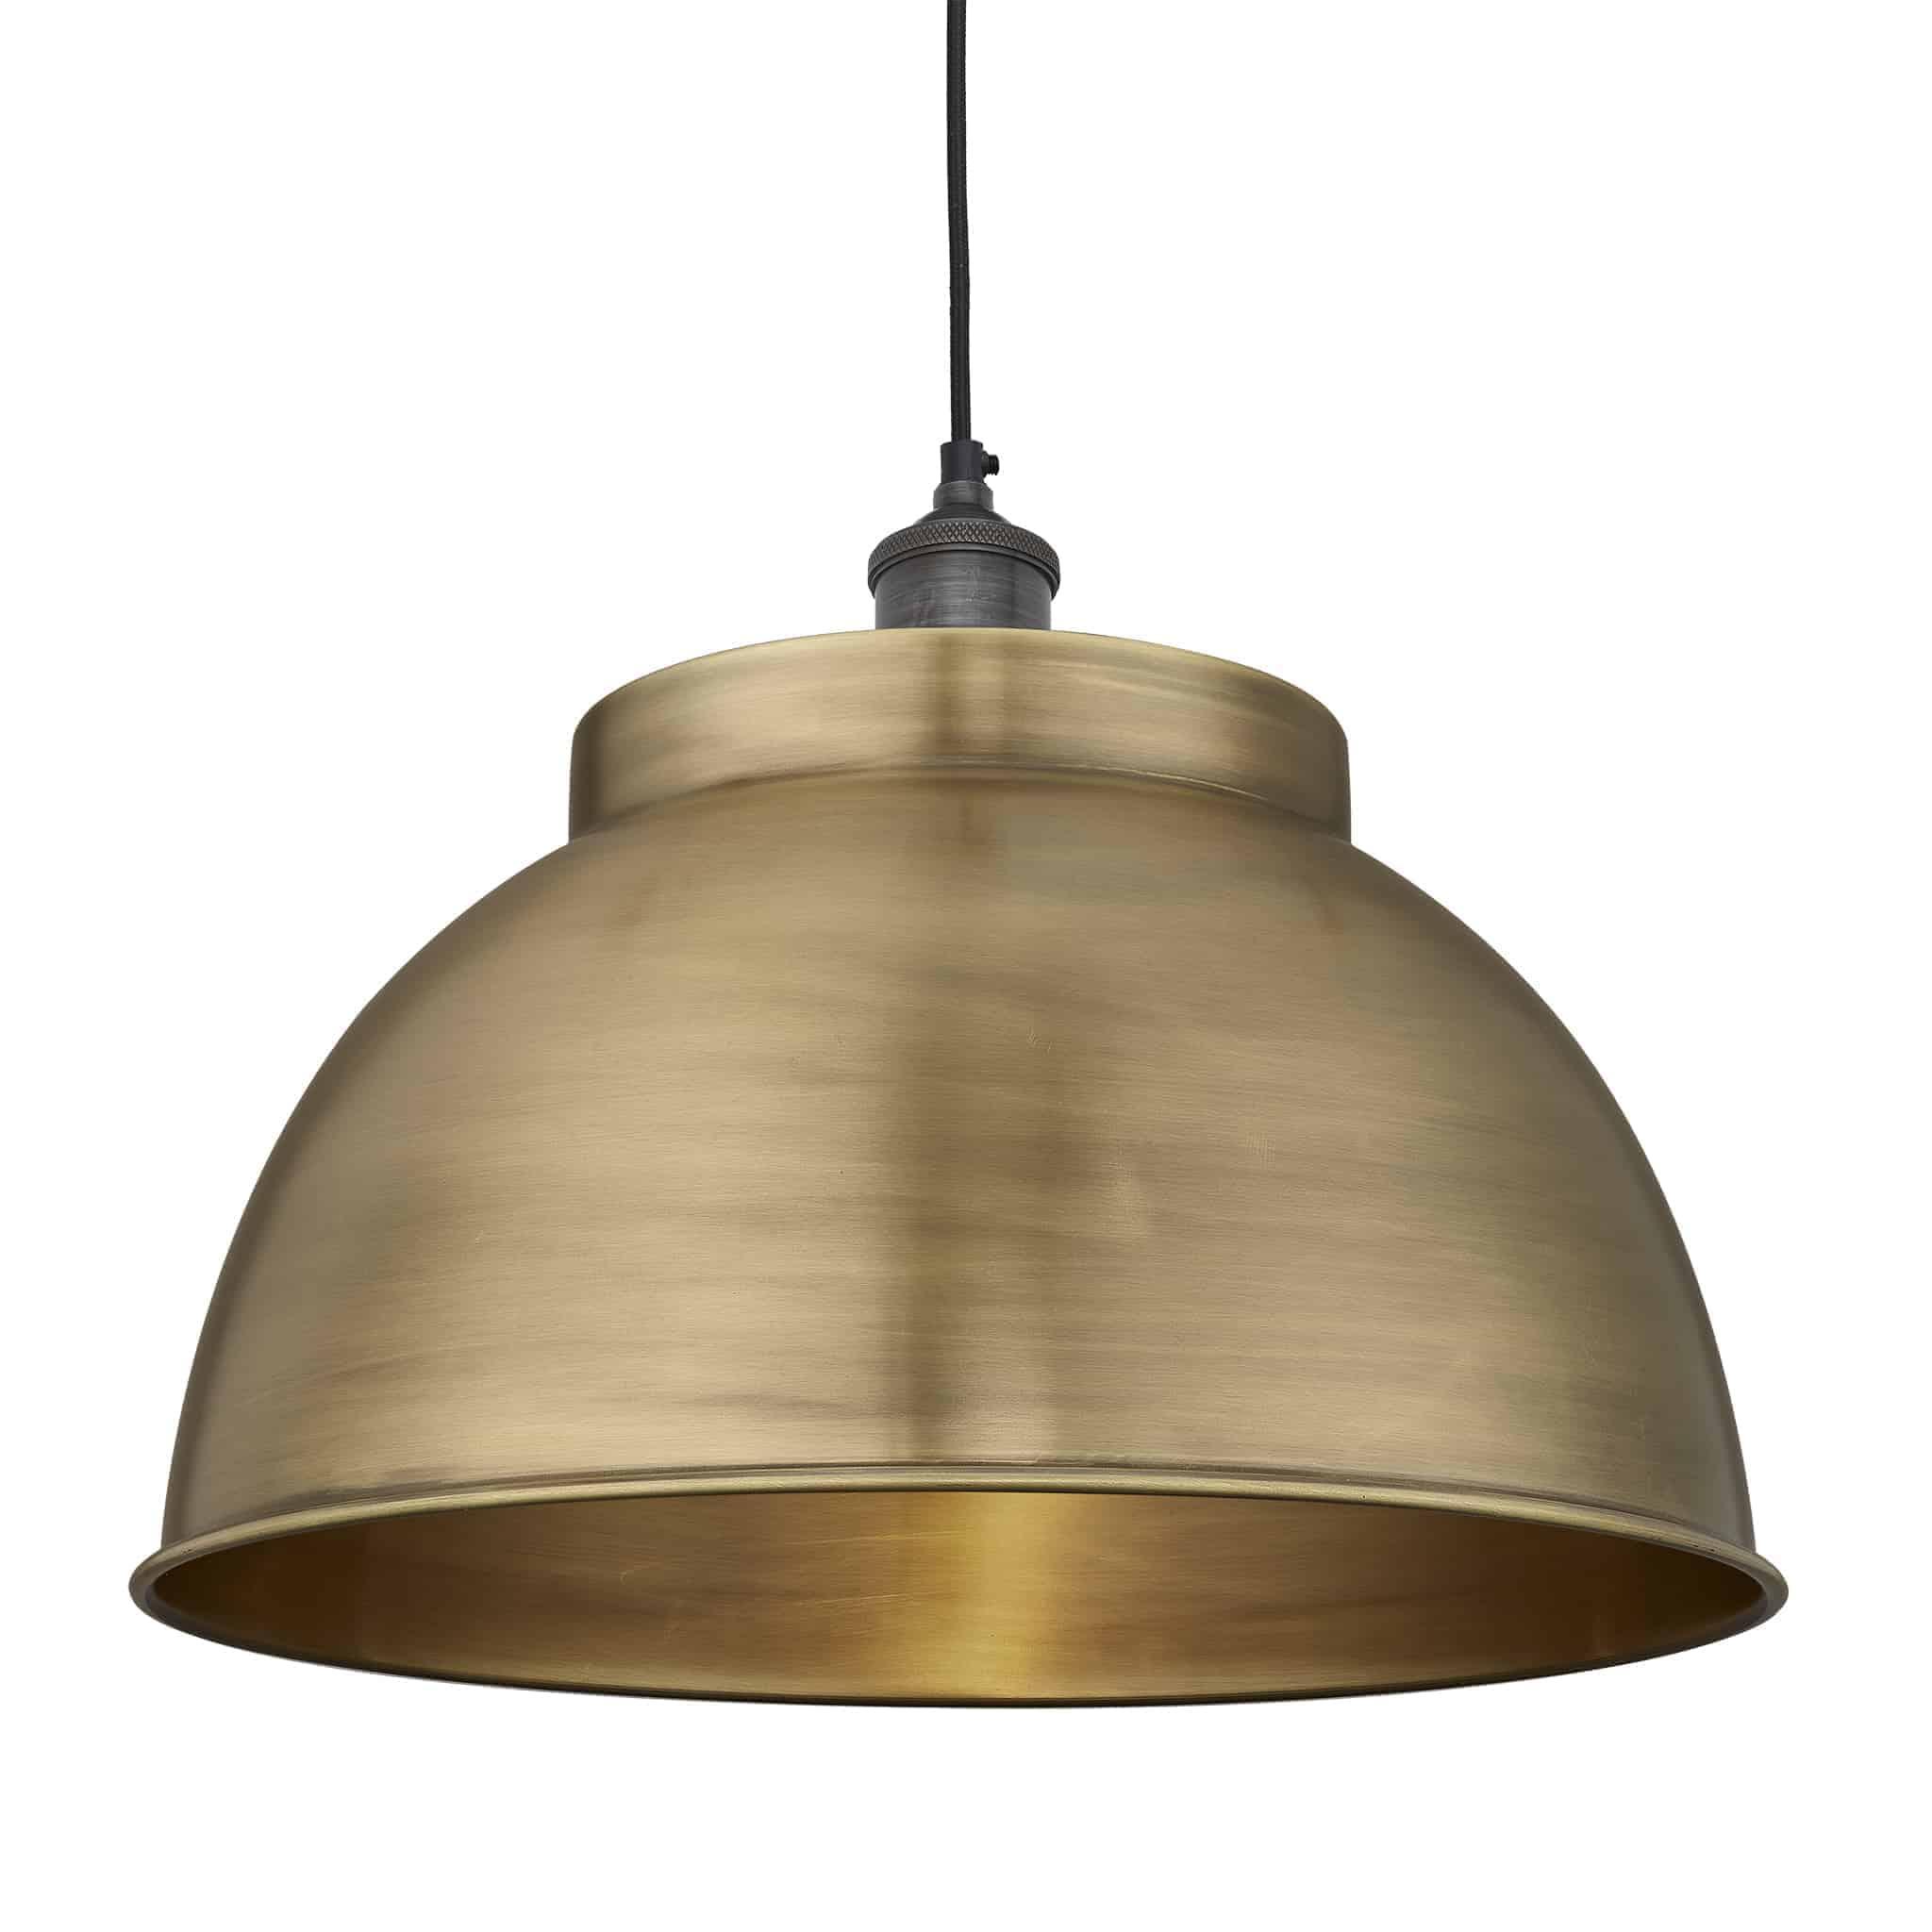 Industville Brooklyn Dome Pendant 17 Inch Brass